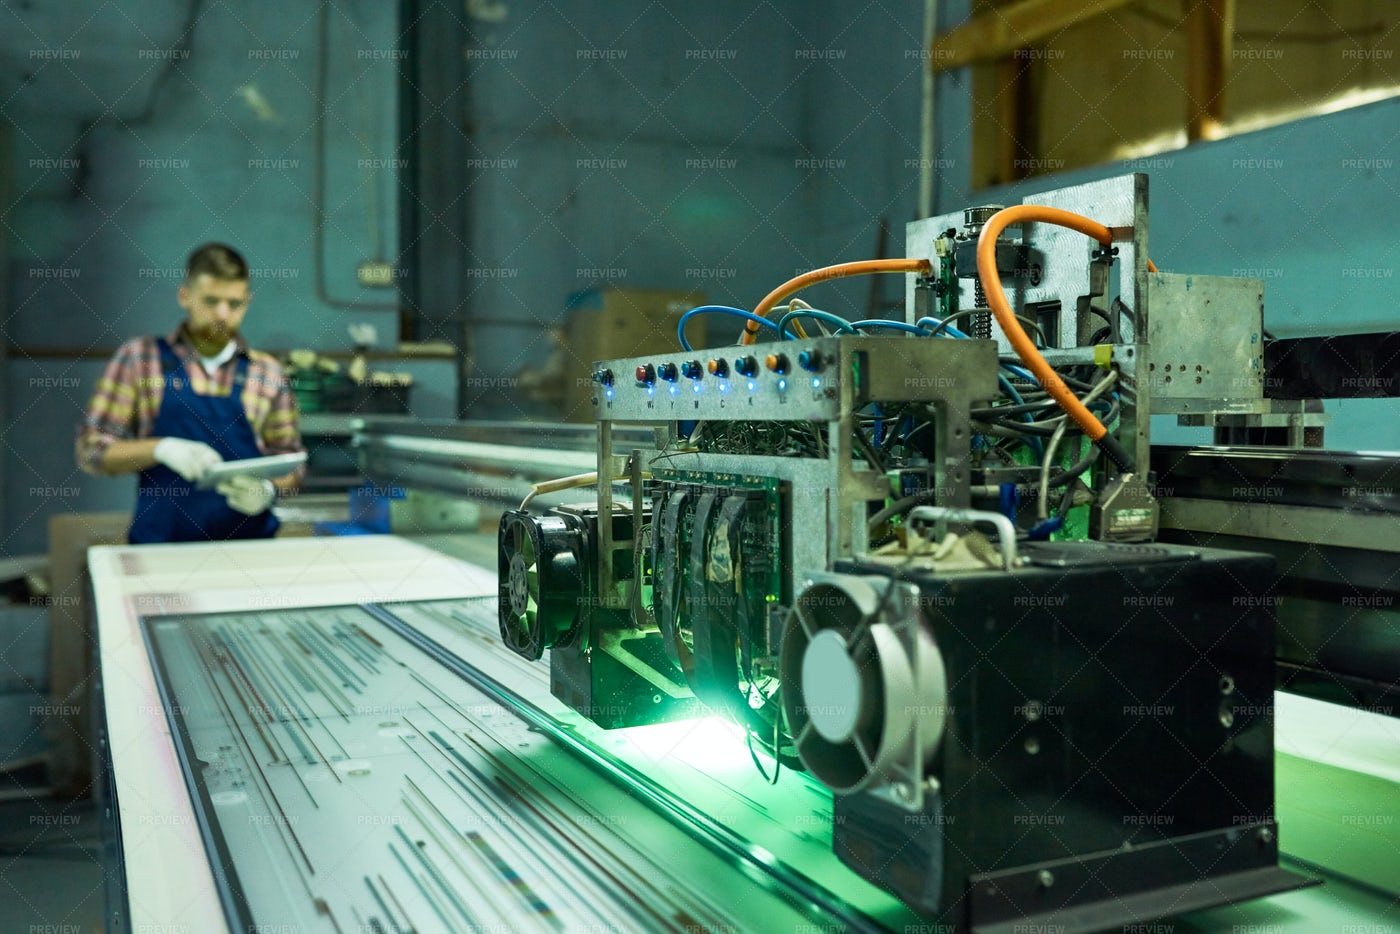 Modern CNC Equipment At Factory: Stock Photos